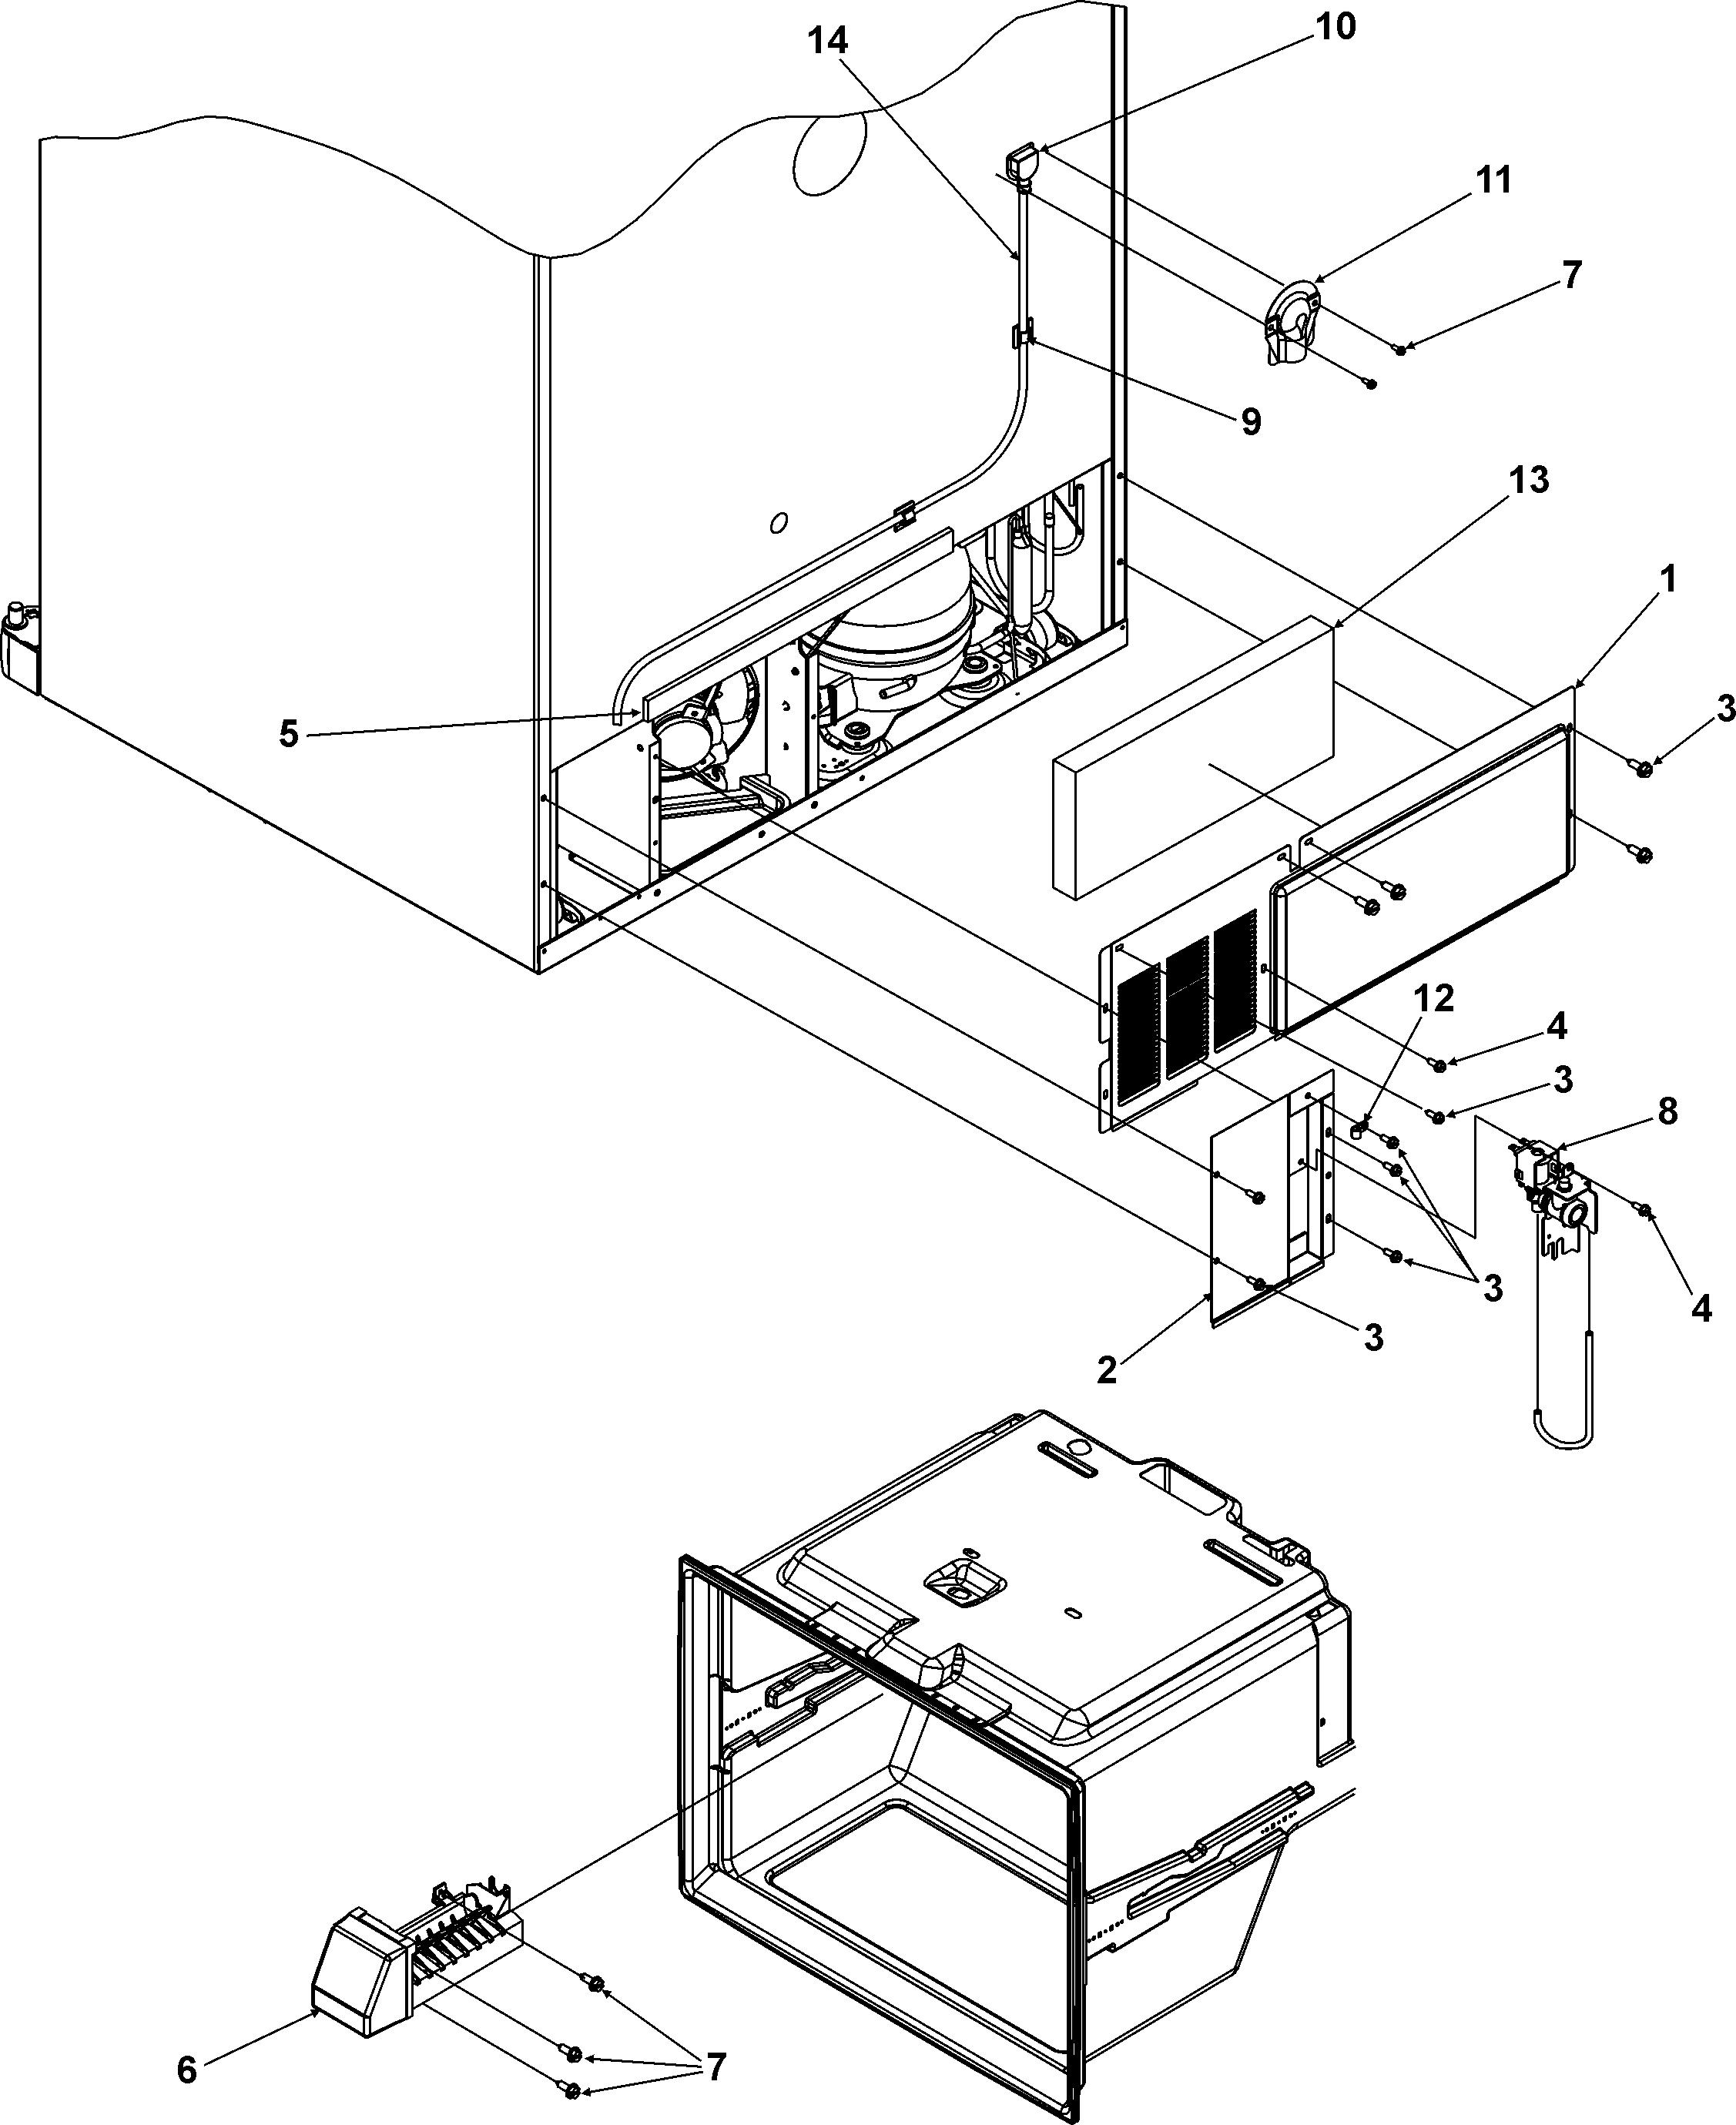 CABINET BACK Diagram & Parts List for Model mbf2254heb